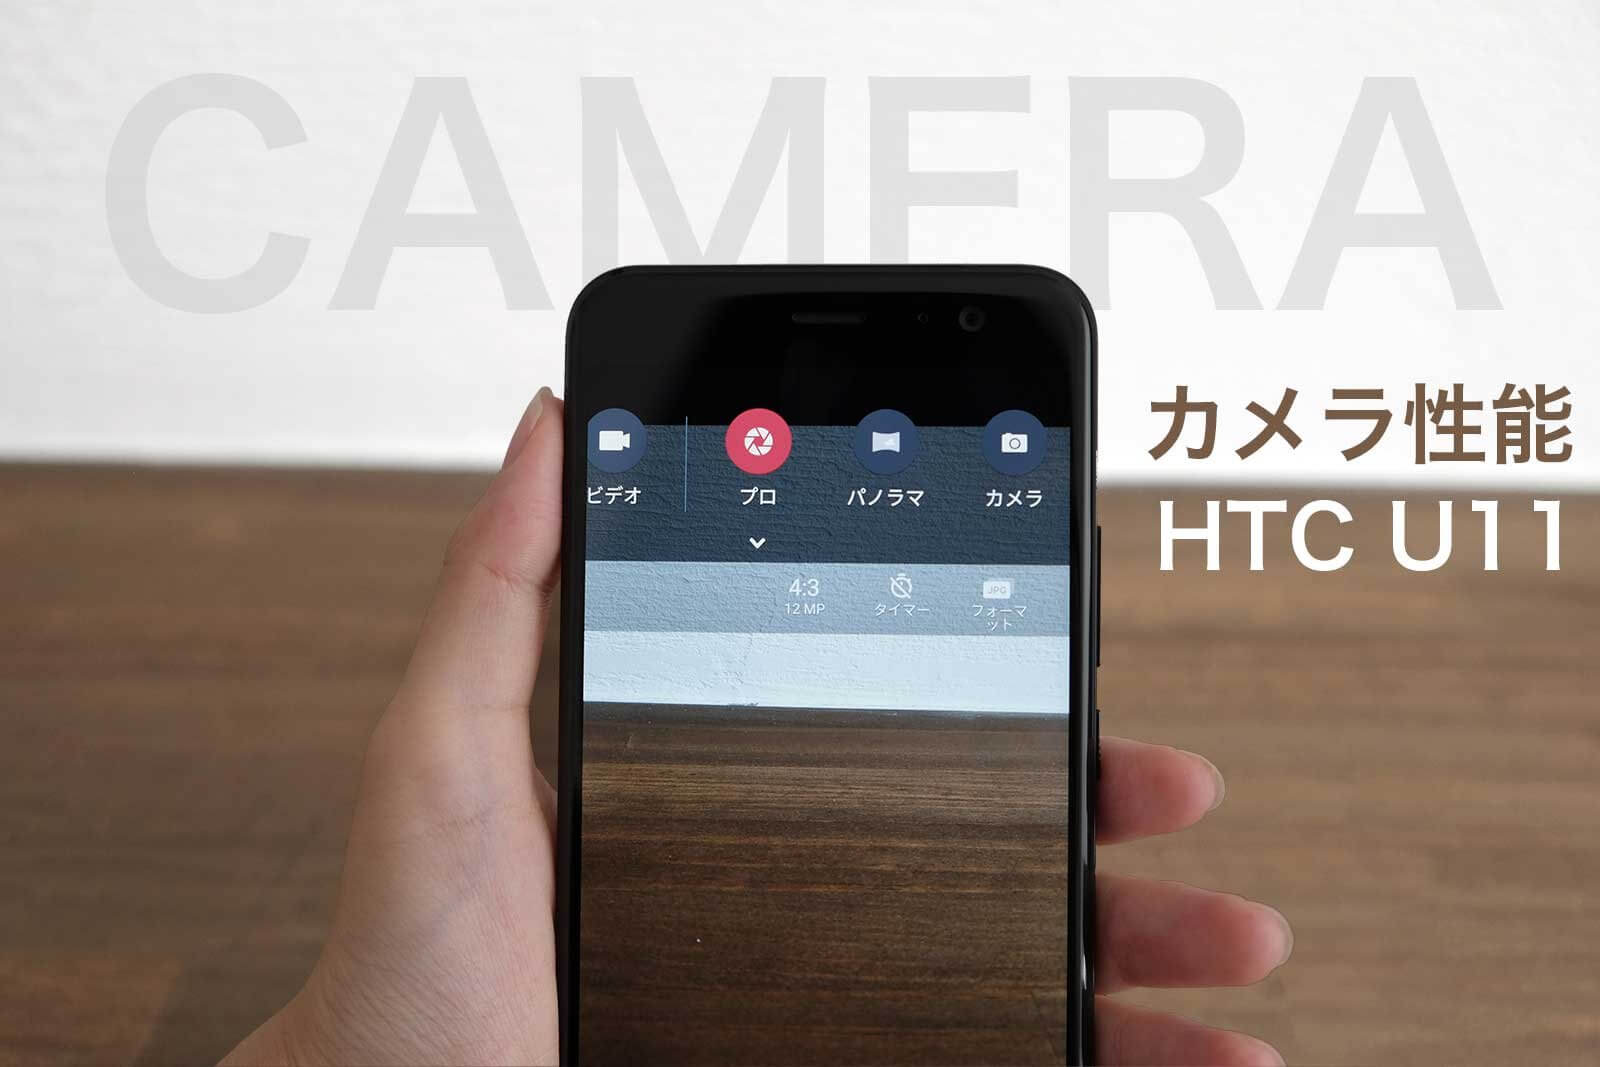 HTC U11のカメラは自然な色で撮れてやっぱり優秀でした!#HTCサポーター